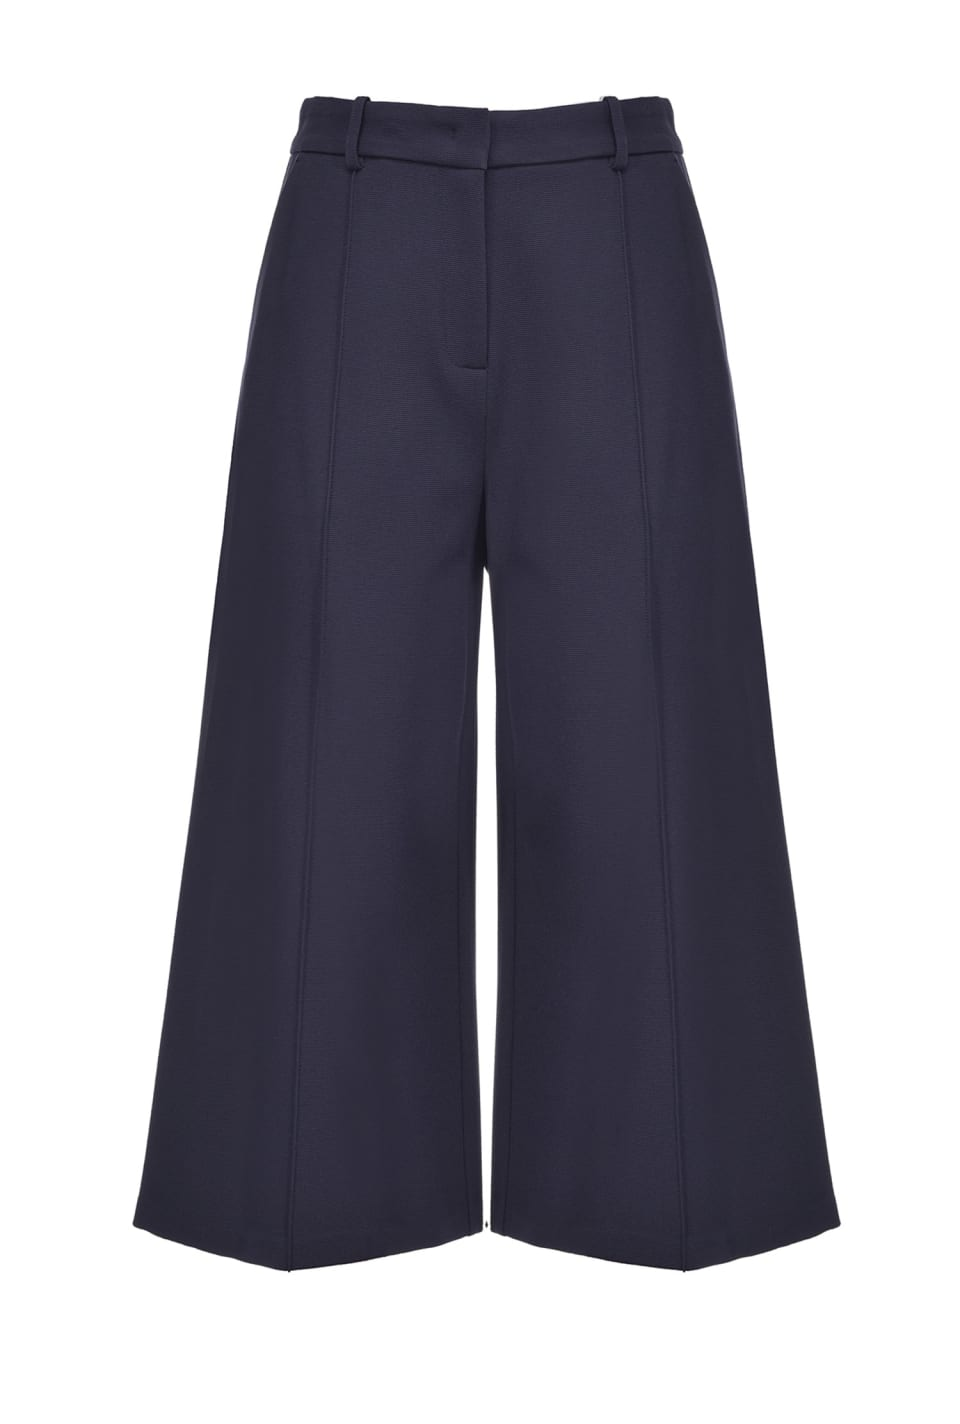 Pantaloni culotte in ottoman - Pinko